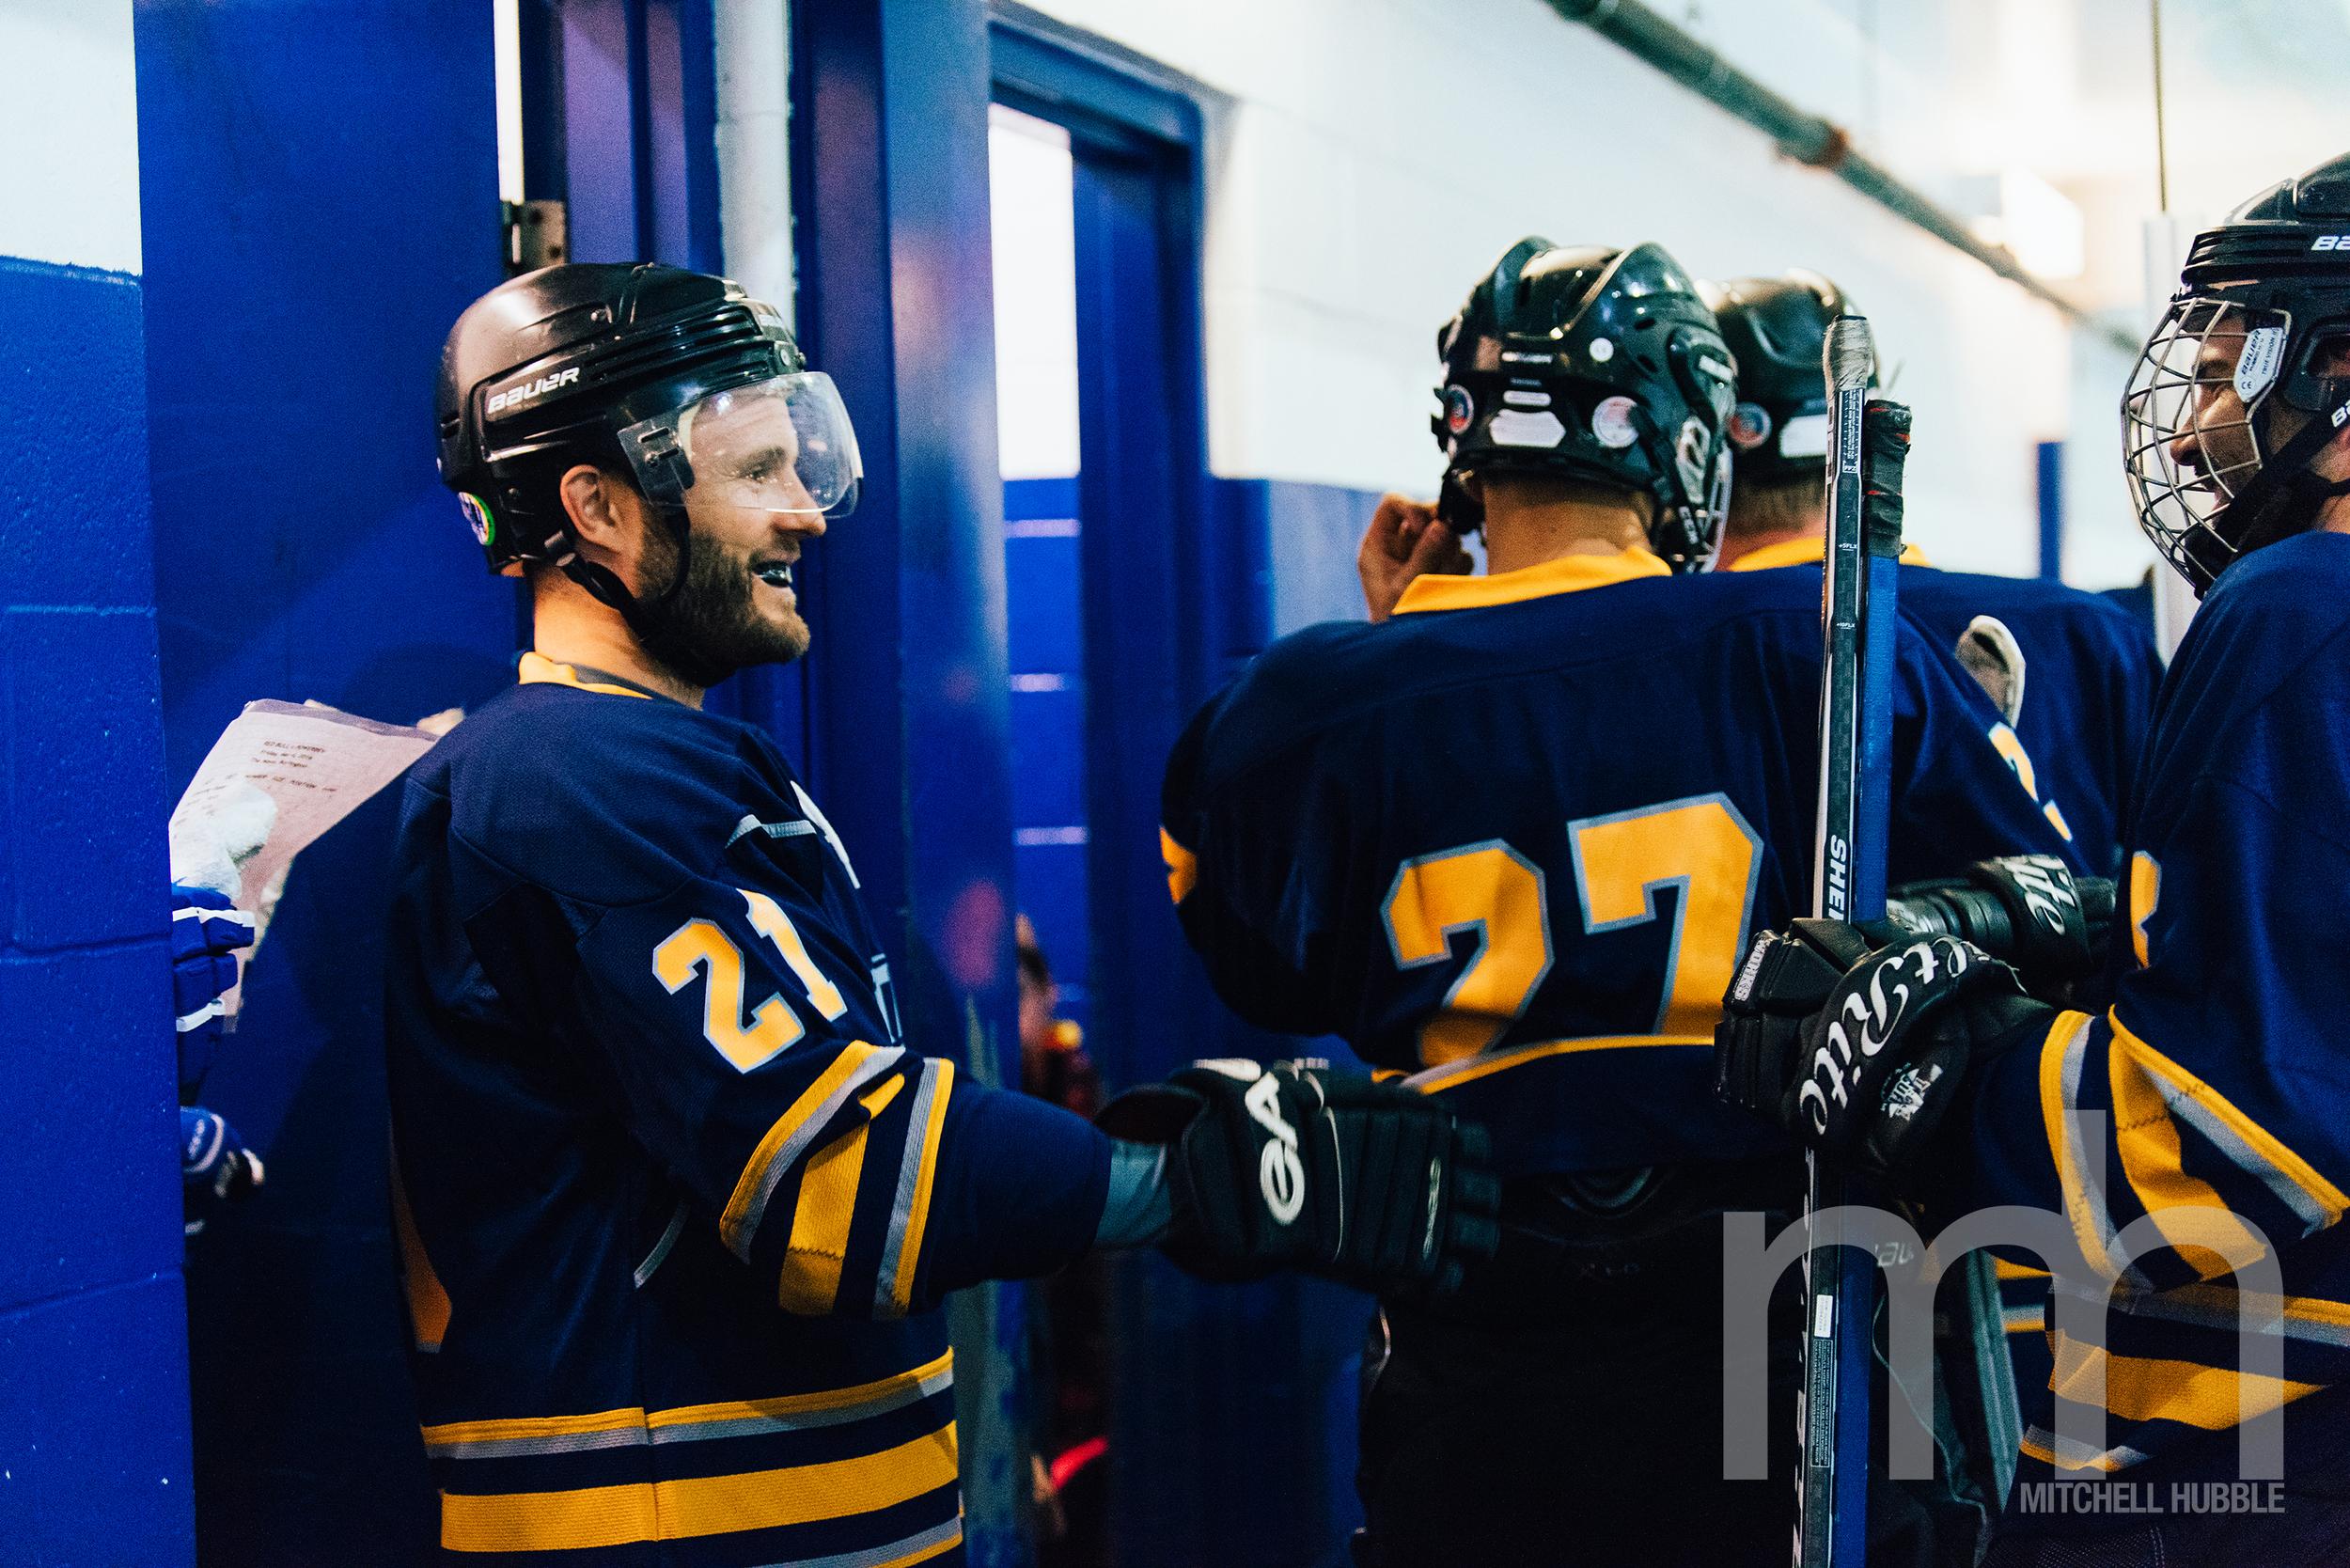 RB_Hockey-1.jpg